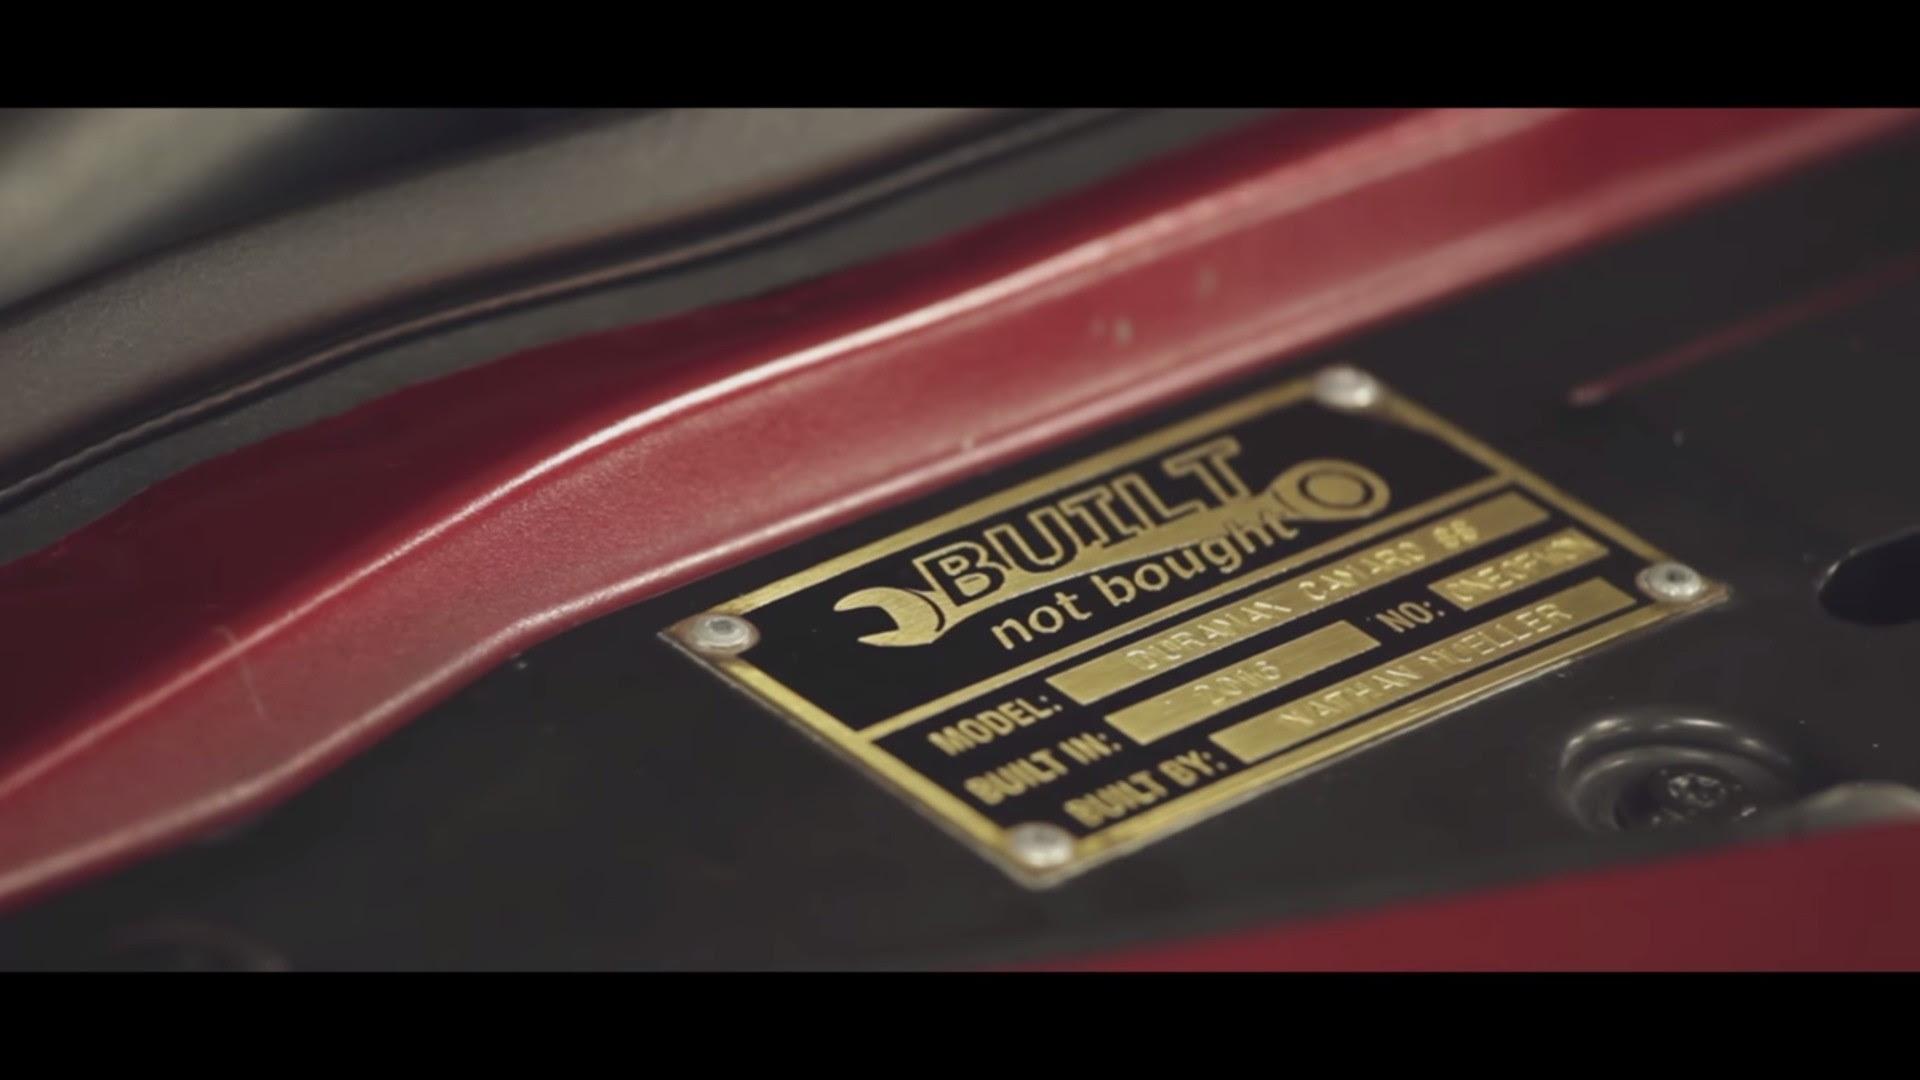 Fast & Furious Dodge Charger is a Lean, Mean, Mopar ...